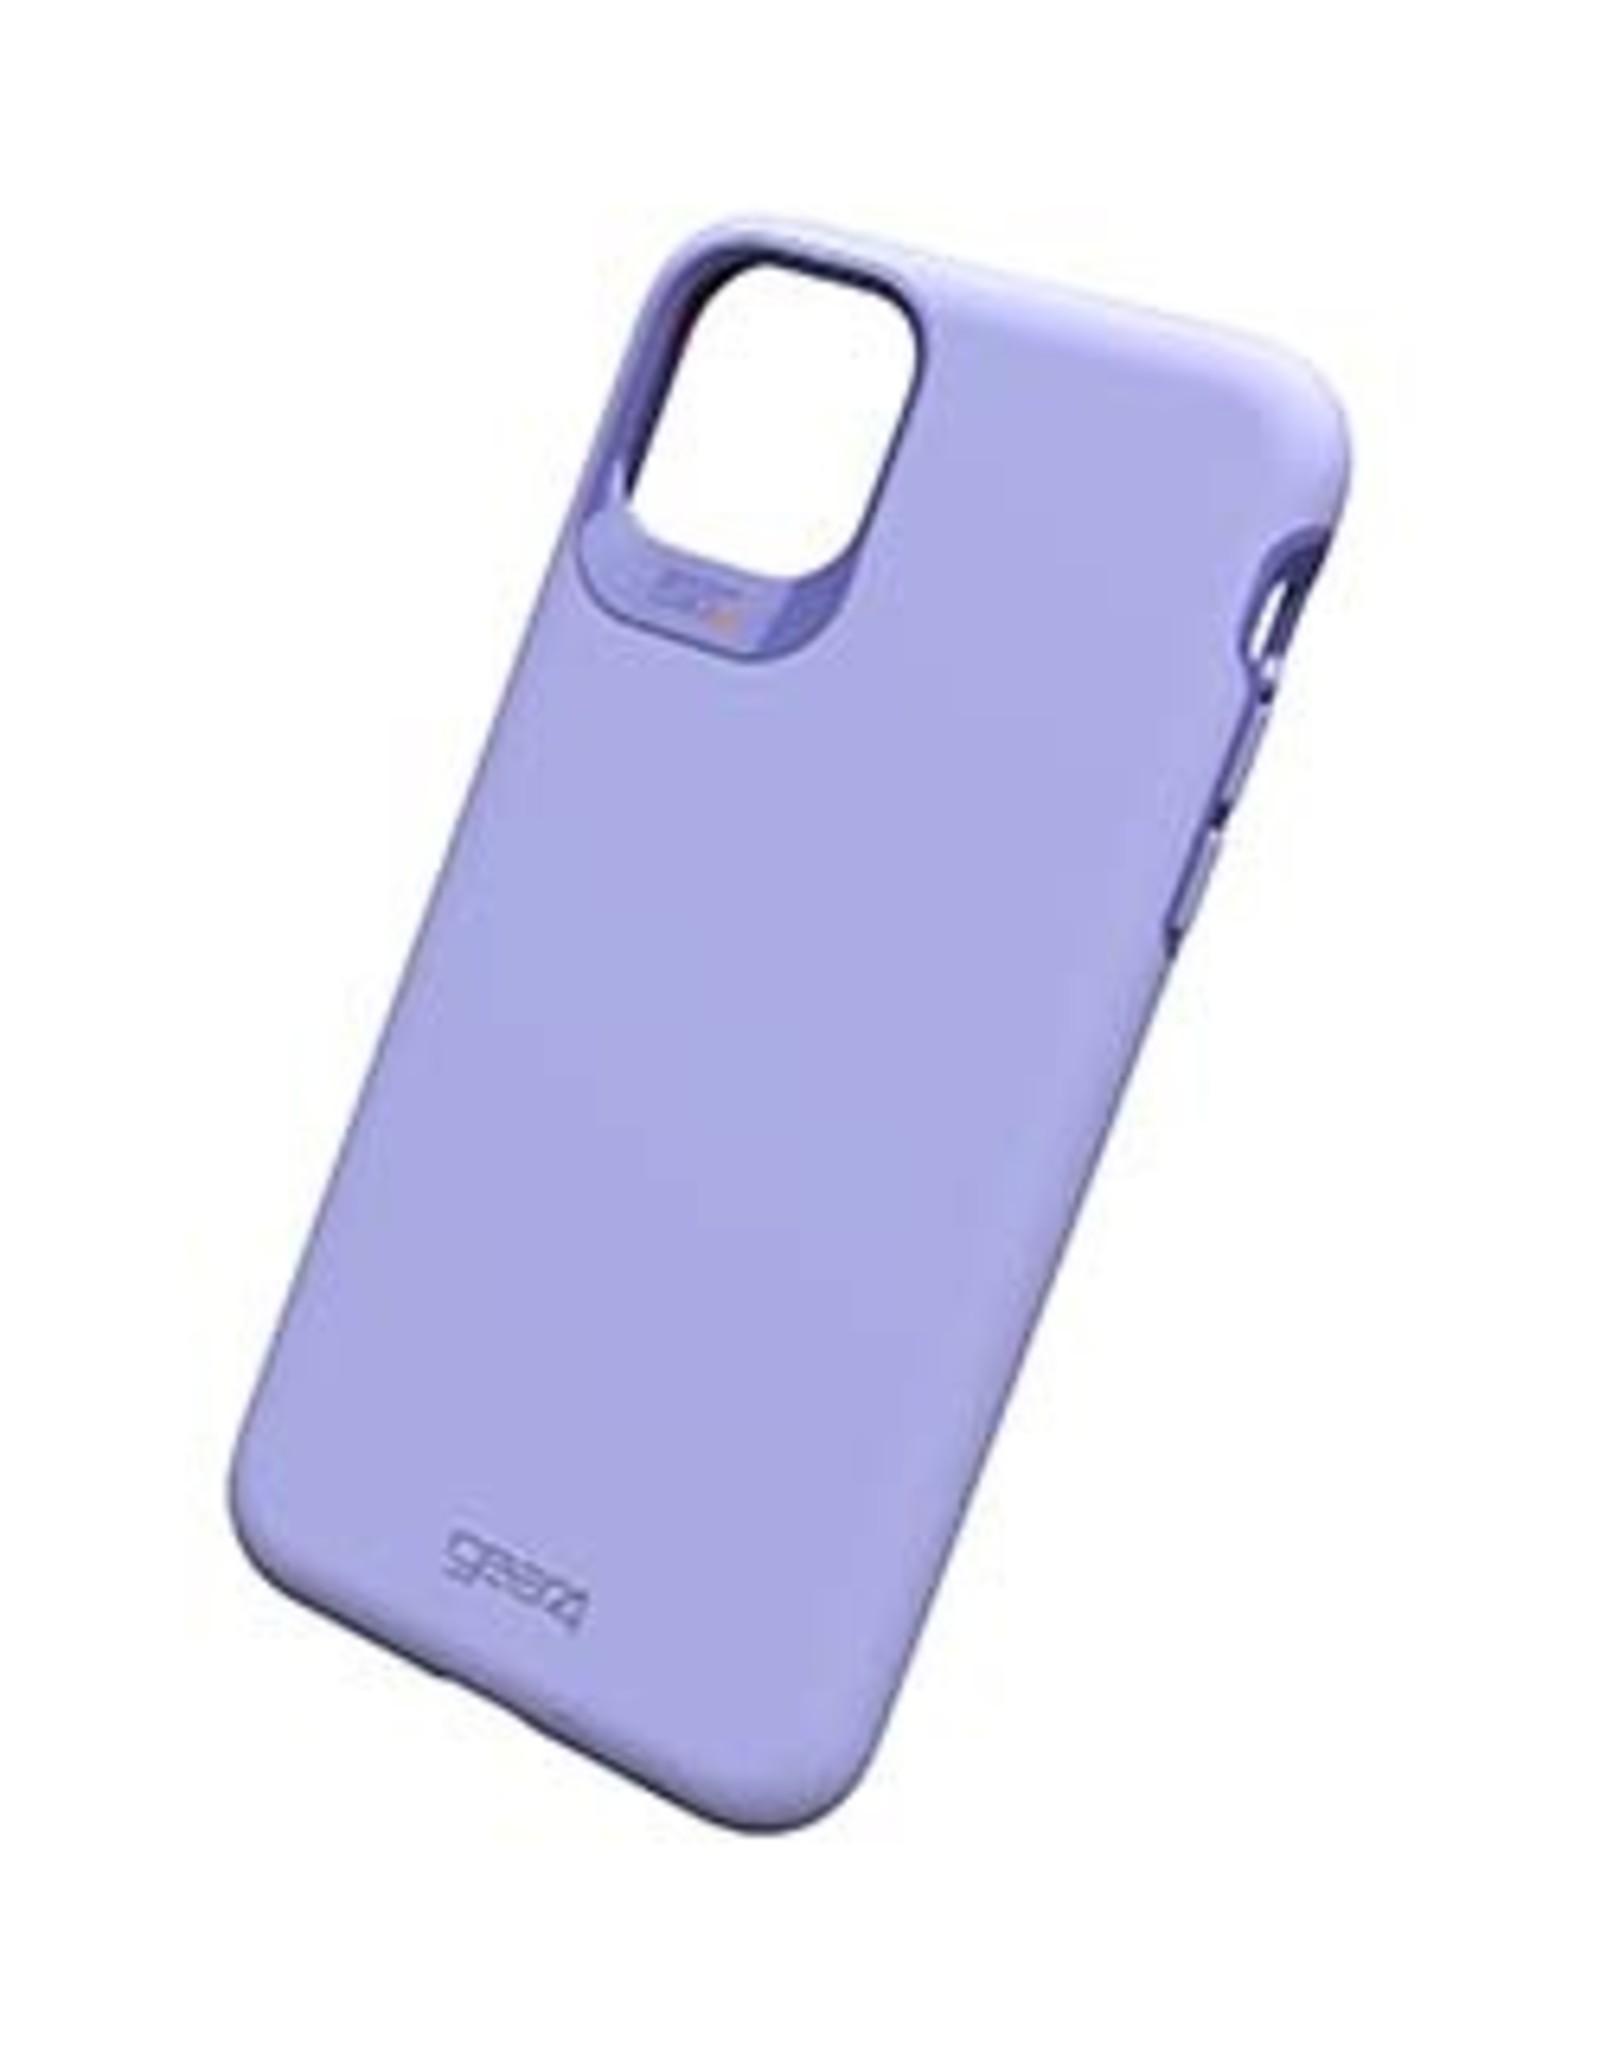 GEAR4 GEAR4   iPhone 11 Pro Max  D3O Purple (Lilac) Holborn Case 15-04829